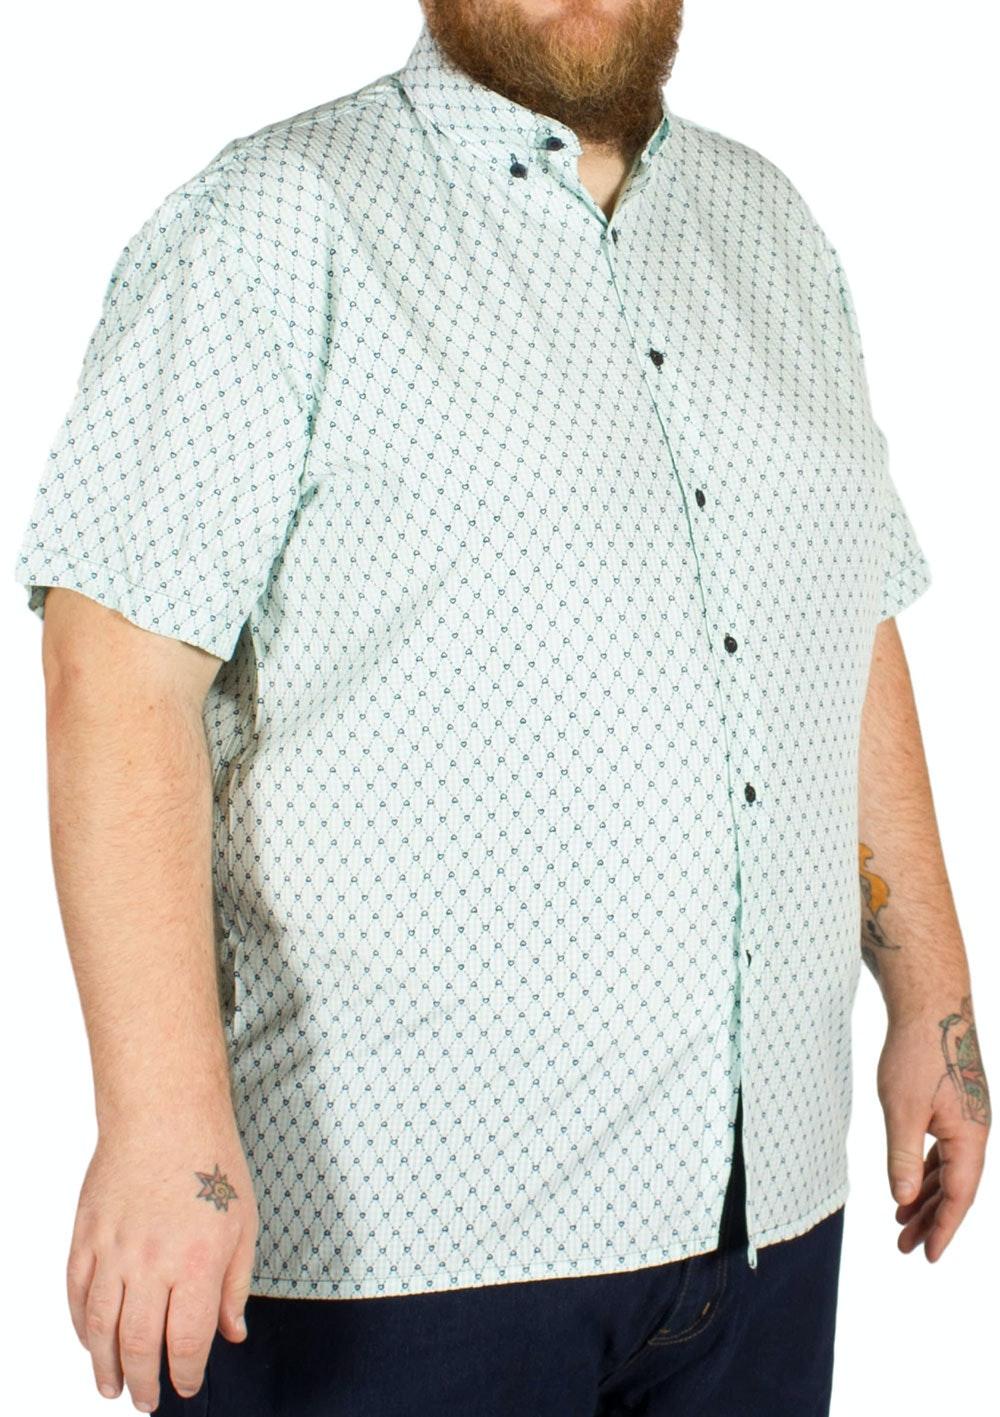 Fitzgerald George Heart Print Check Shirt Green